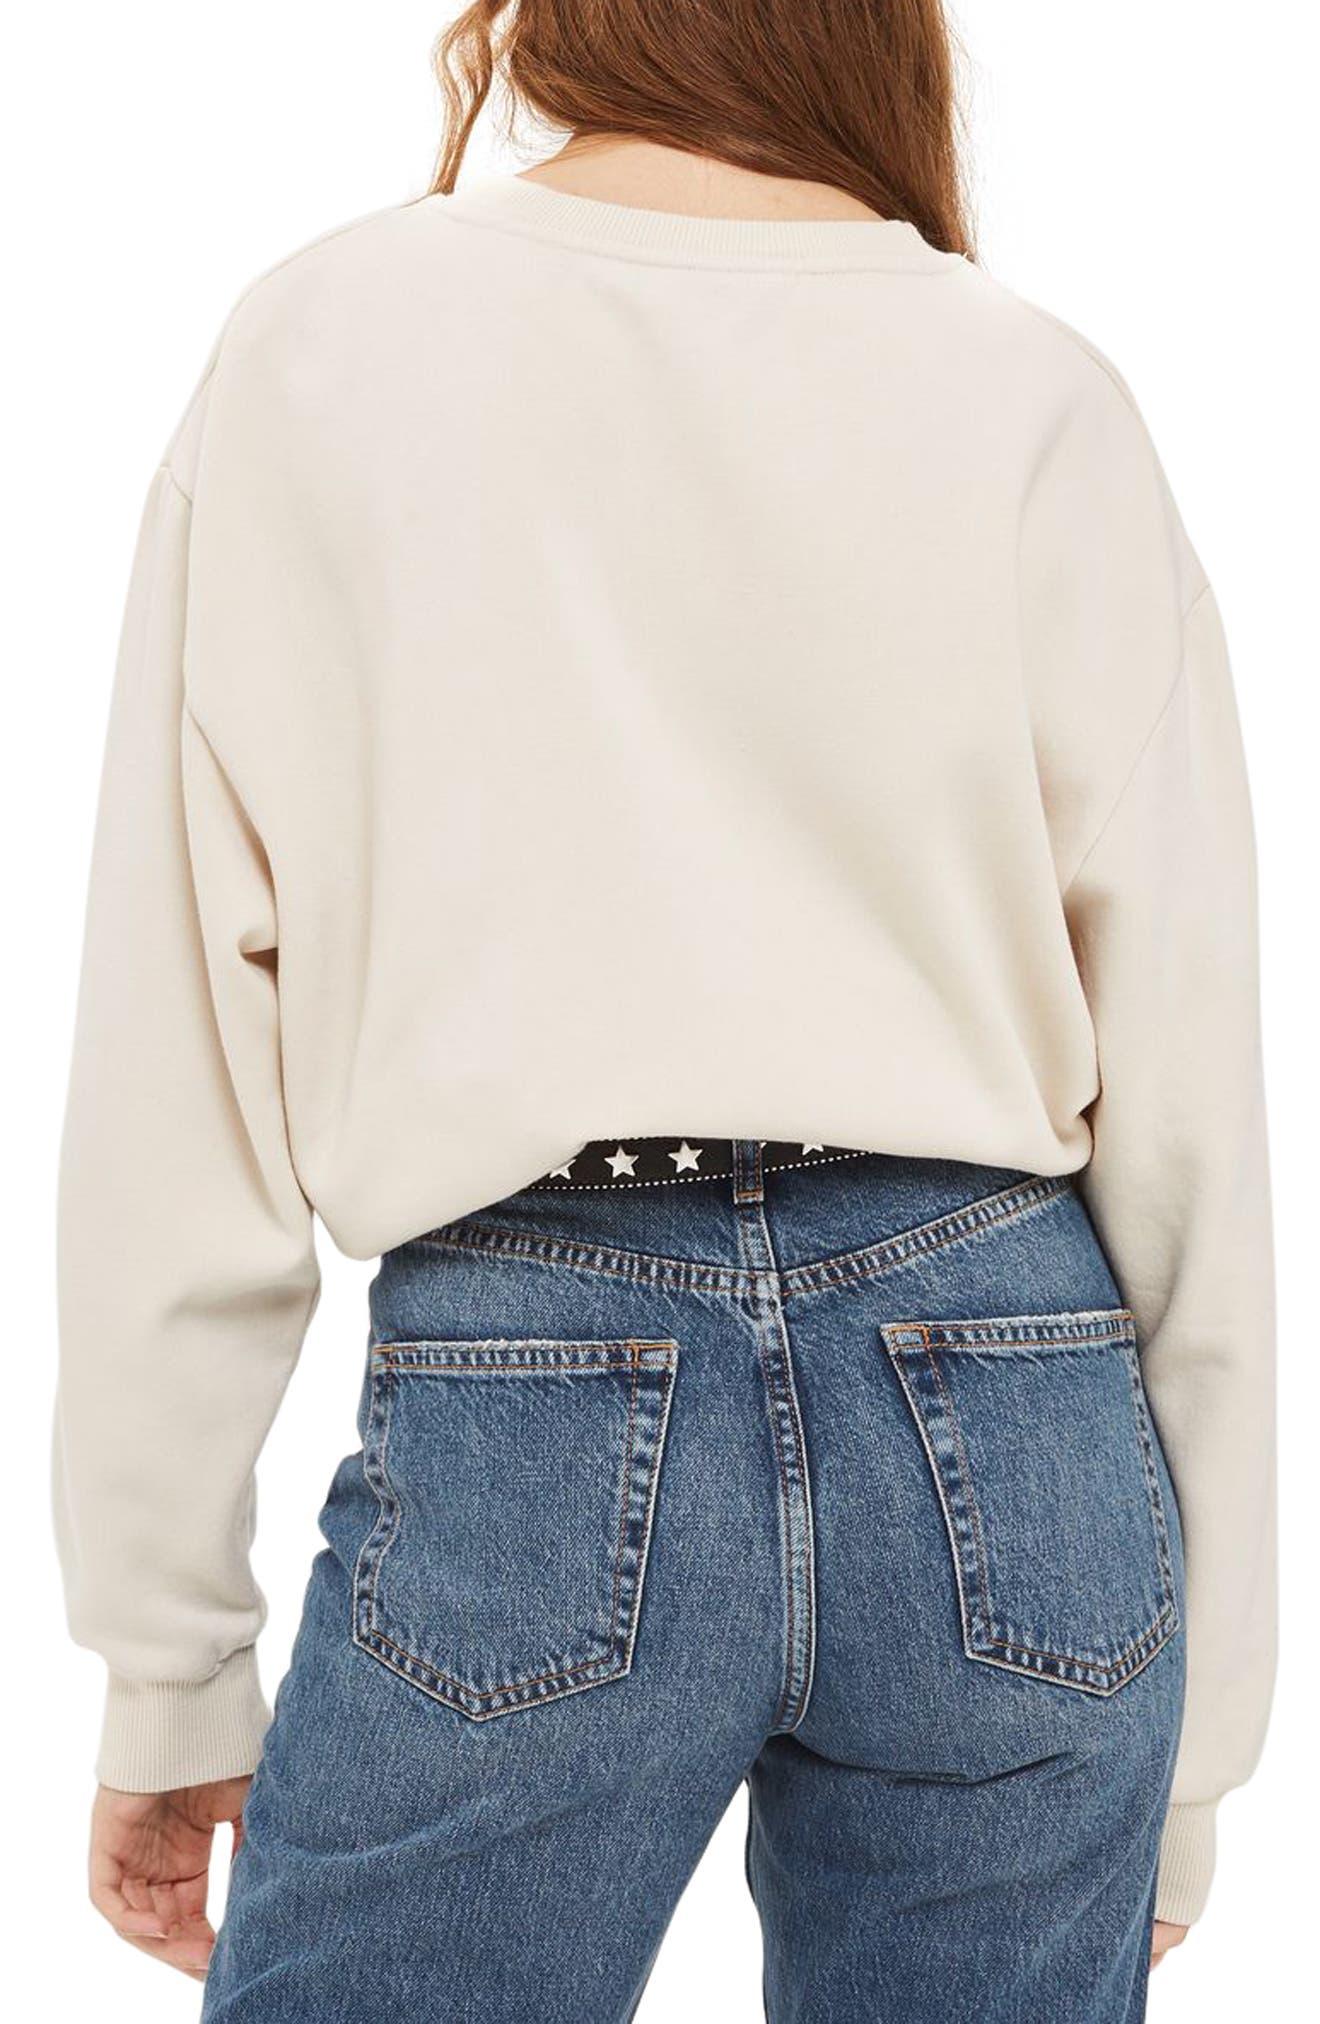 Sloppy Sweatshirt,                             Alternate thumbnail 2, color,                             020